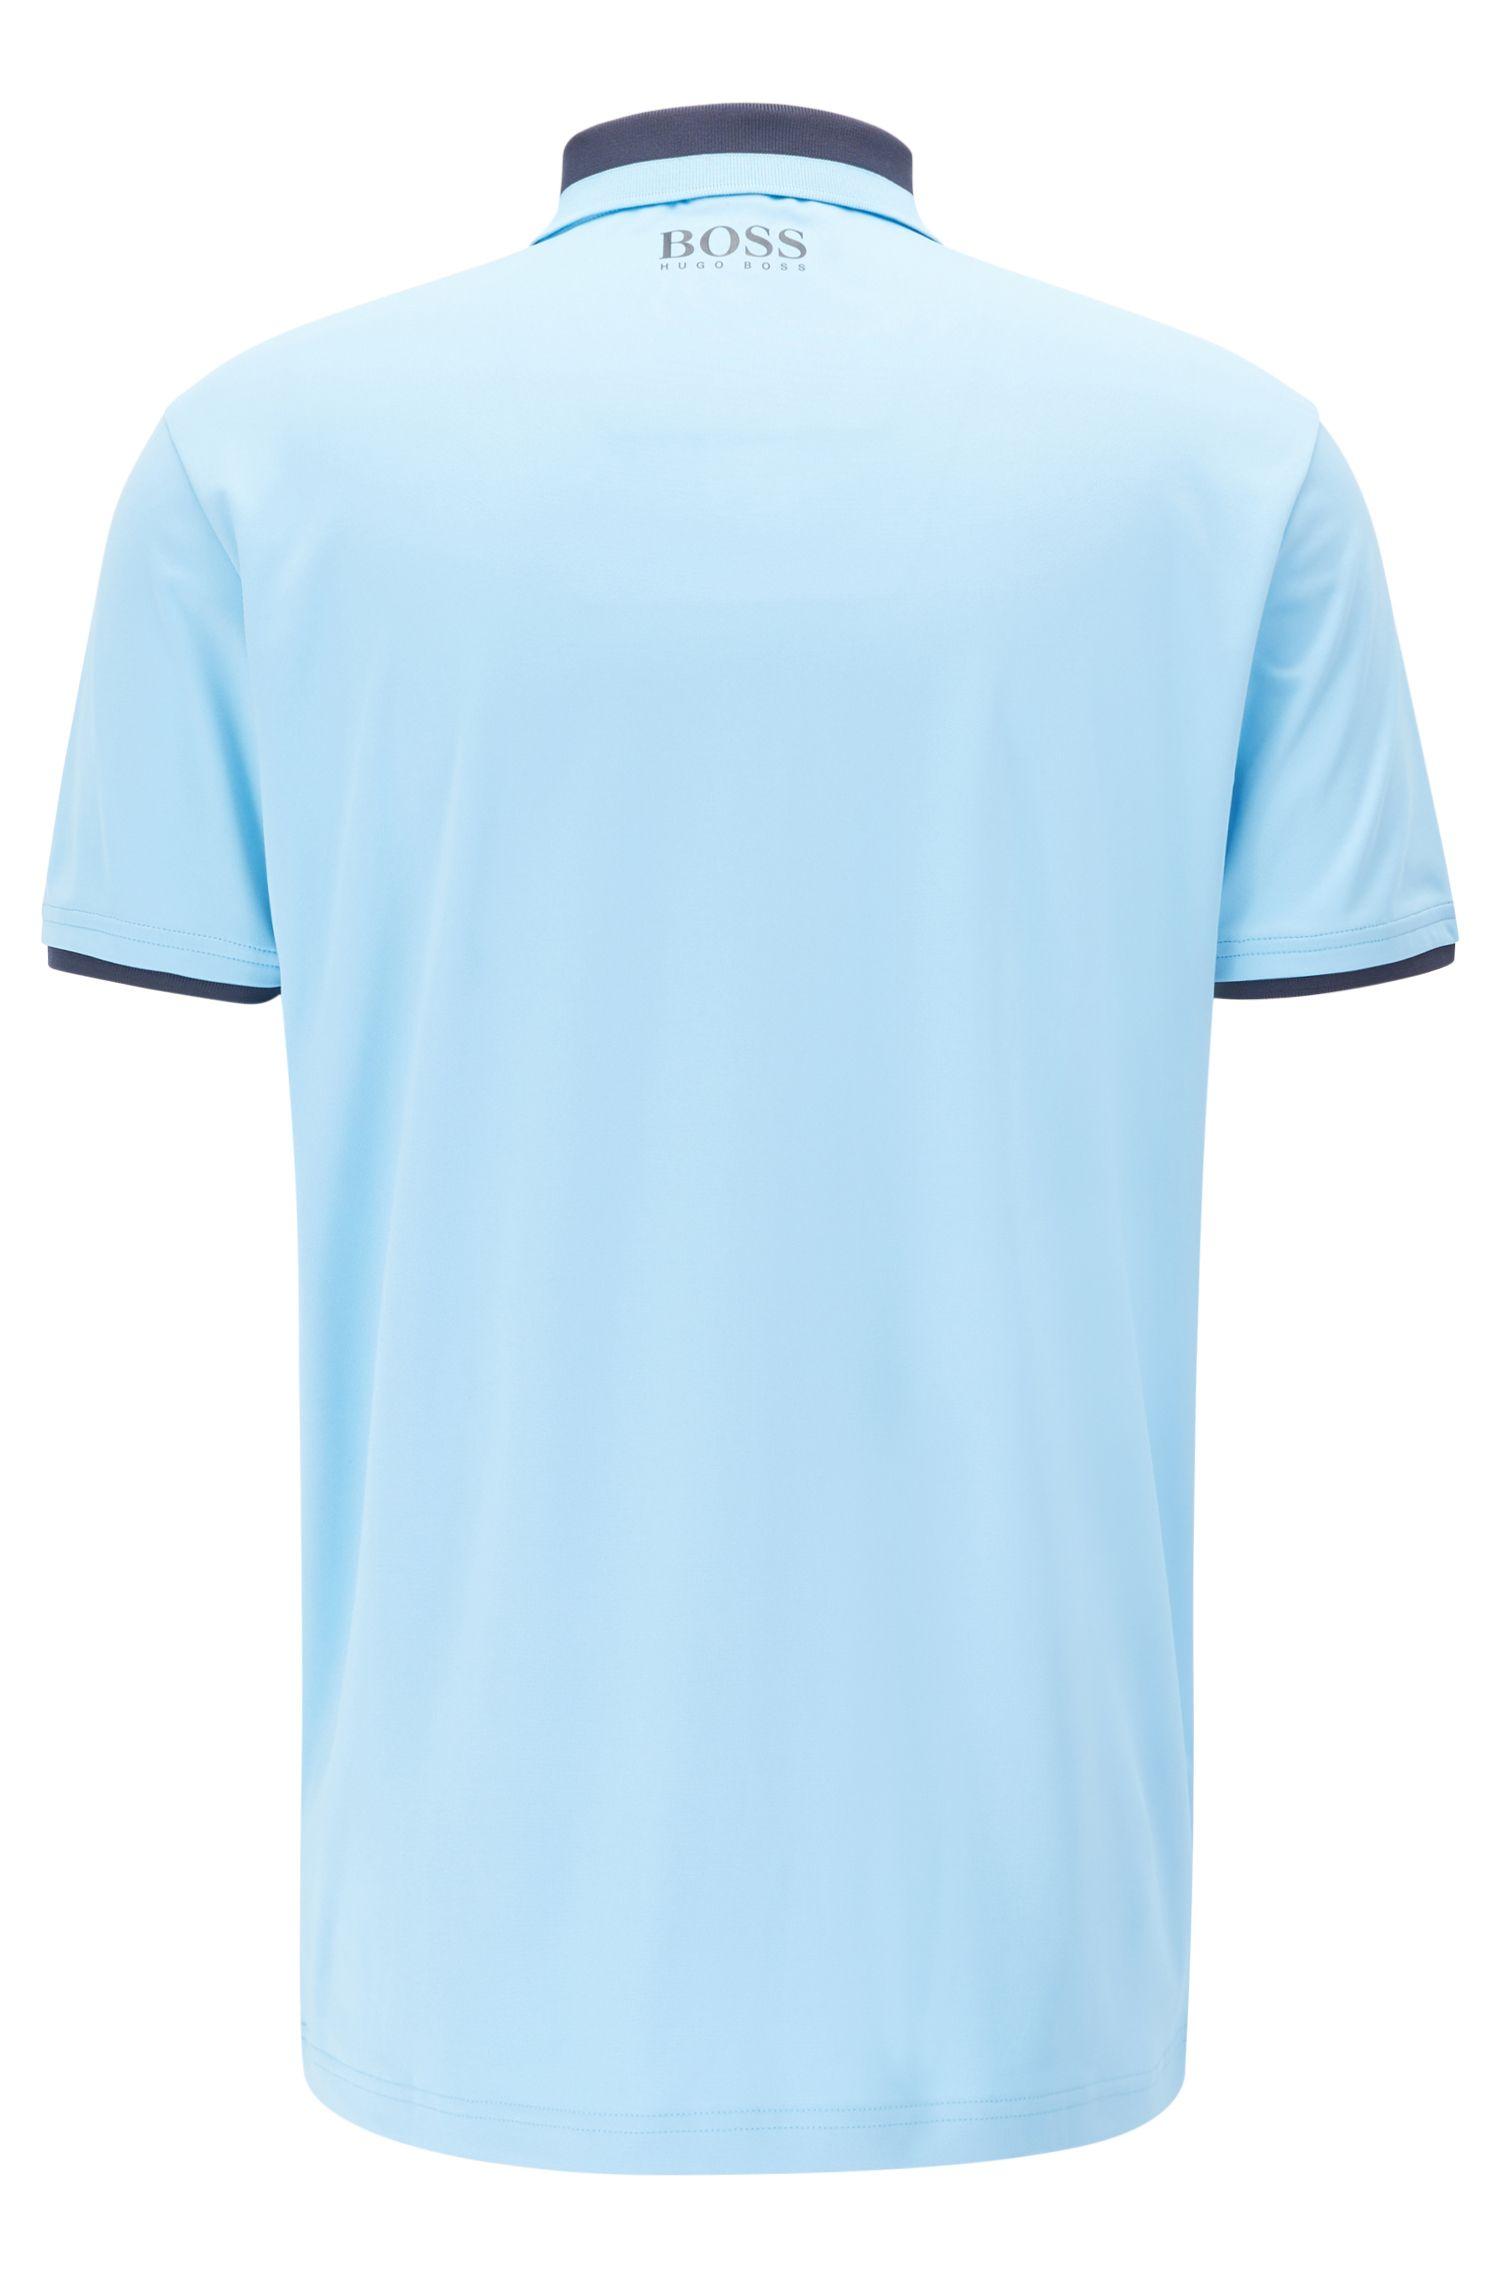 Poloshirt aus Material-Mix mit S.Café®-Technologie